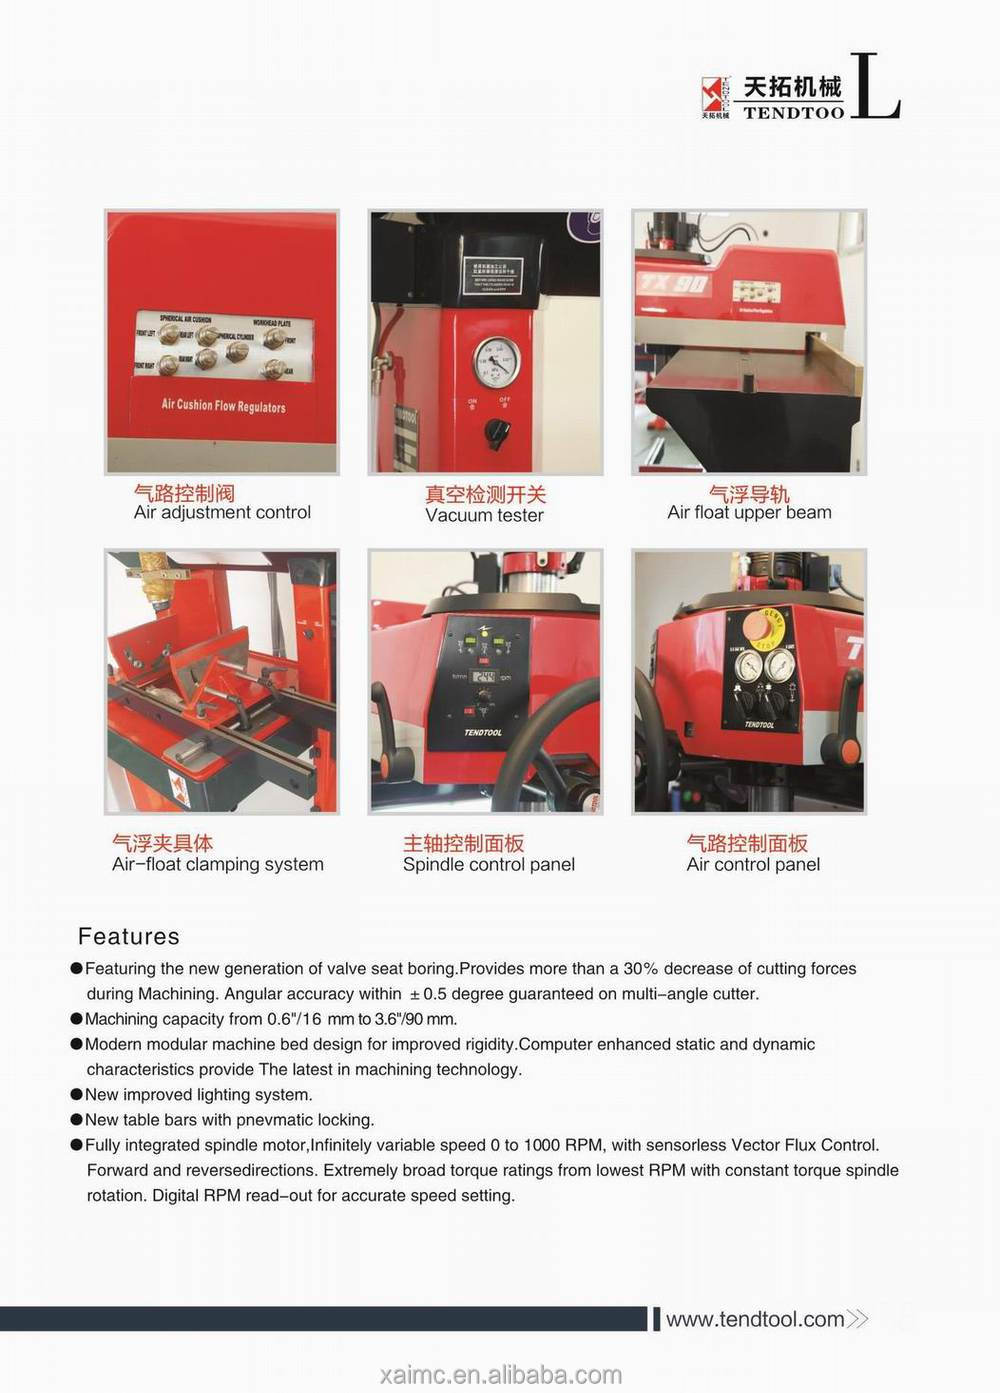 High quality Valve Seat Boring Machine TX90 with cheap price